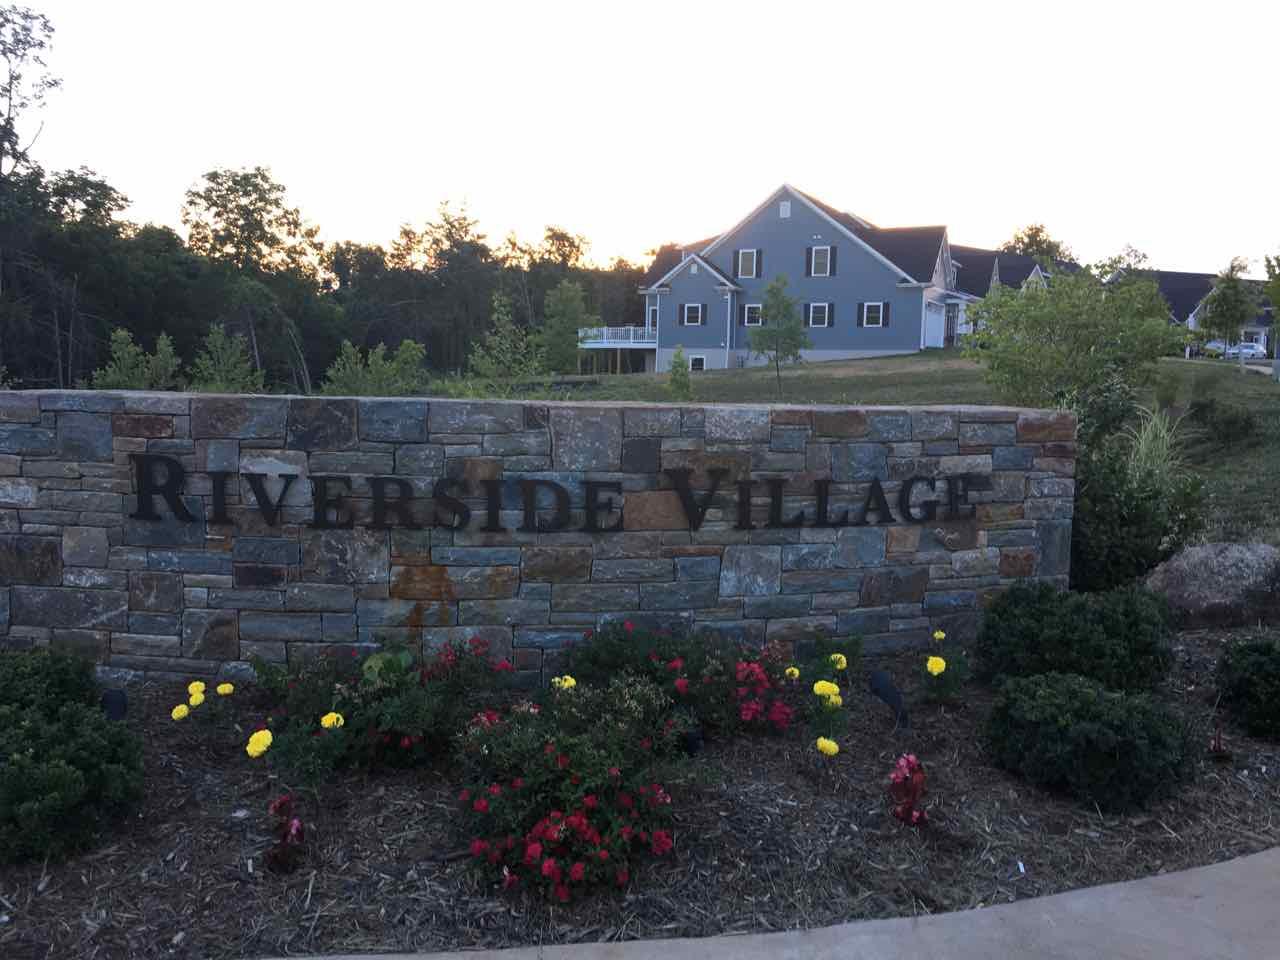 Entrance to new home community Riverside Village Charlottesville